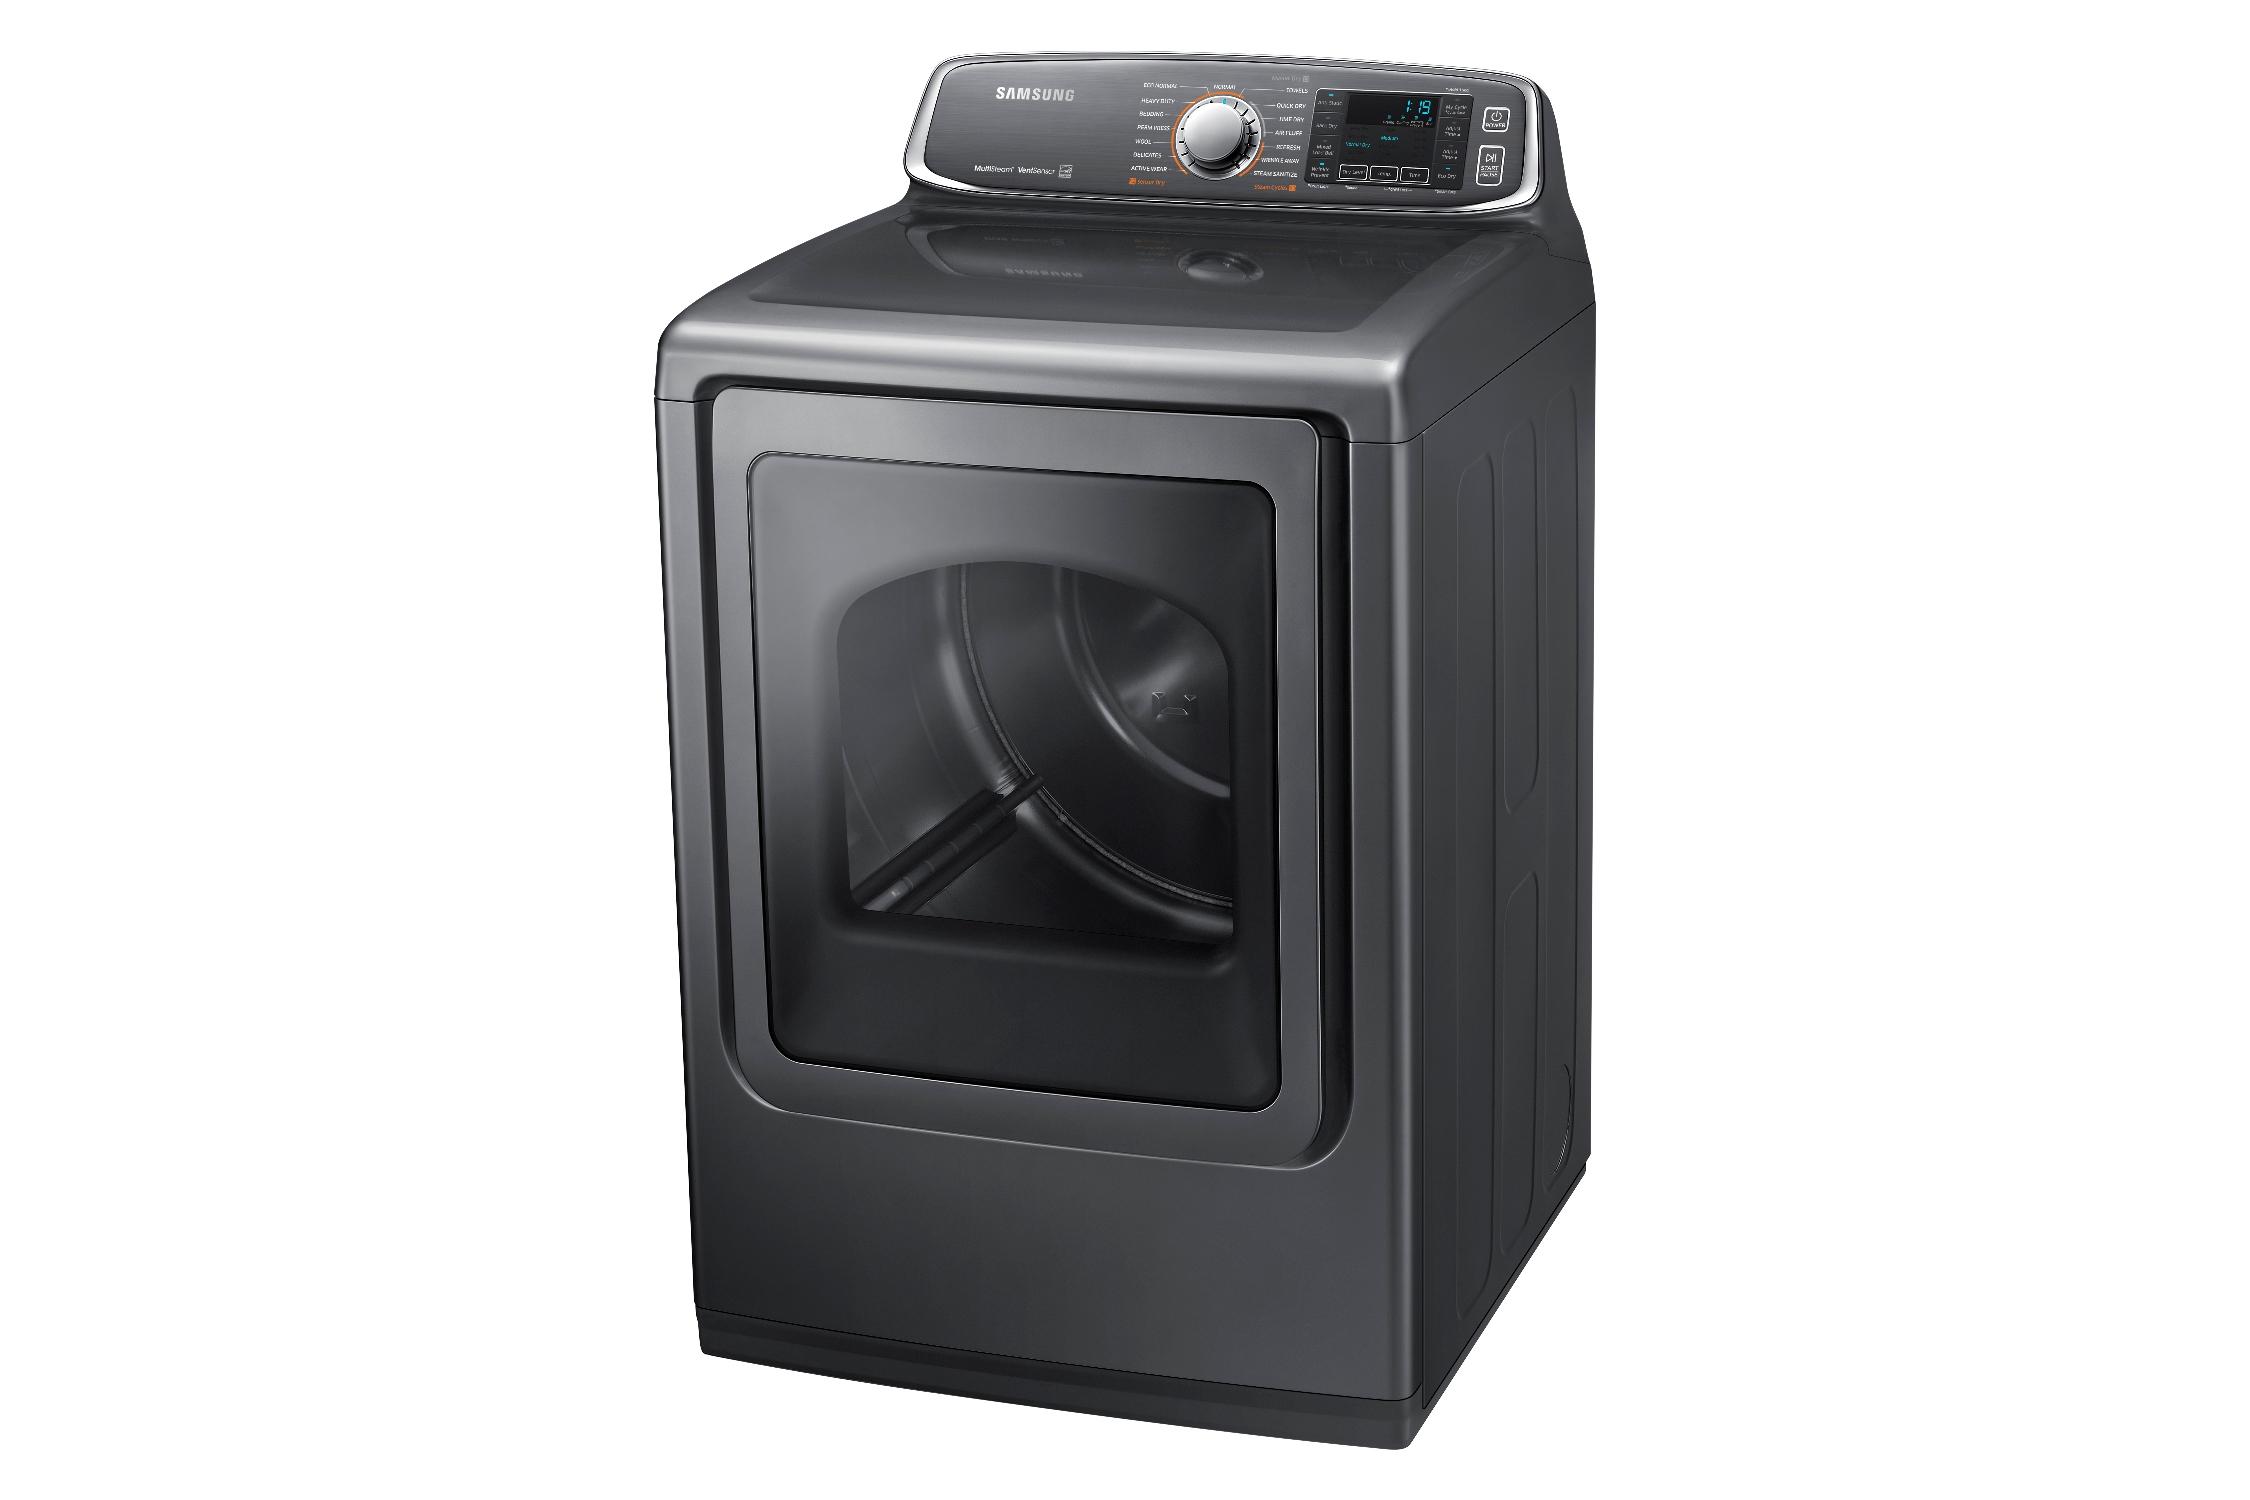 Samsung DV52J8700GP/A2 7.4 cu. ft. Large Capacity Gas Front Load Dryer Platinum